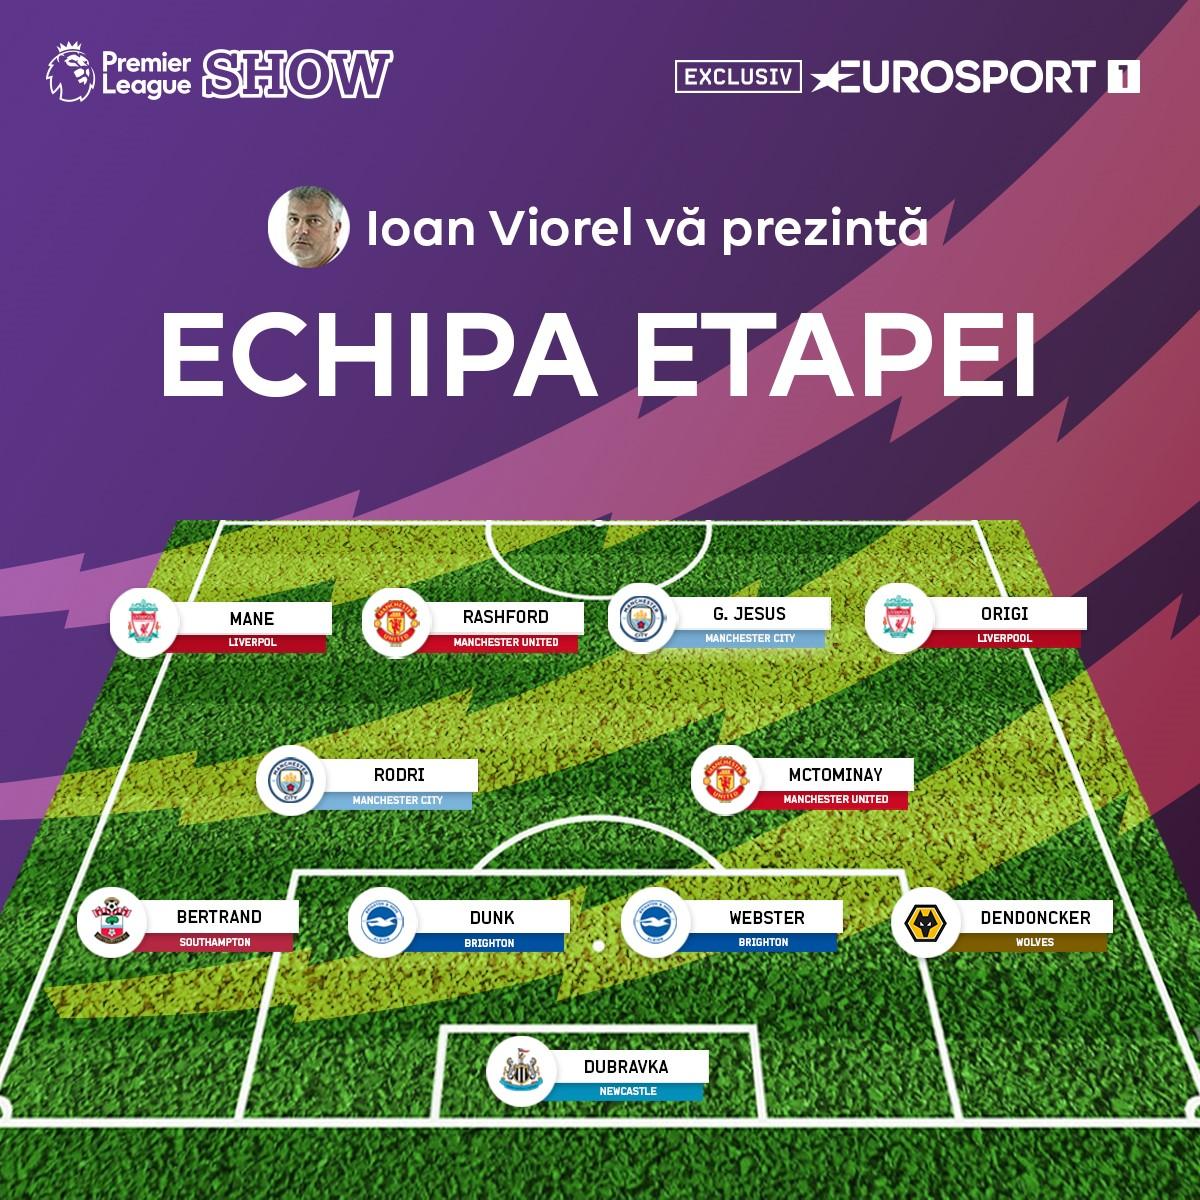 https://i.eurosport.com/2019/12/06/2731008.jpg